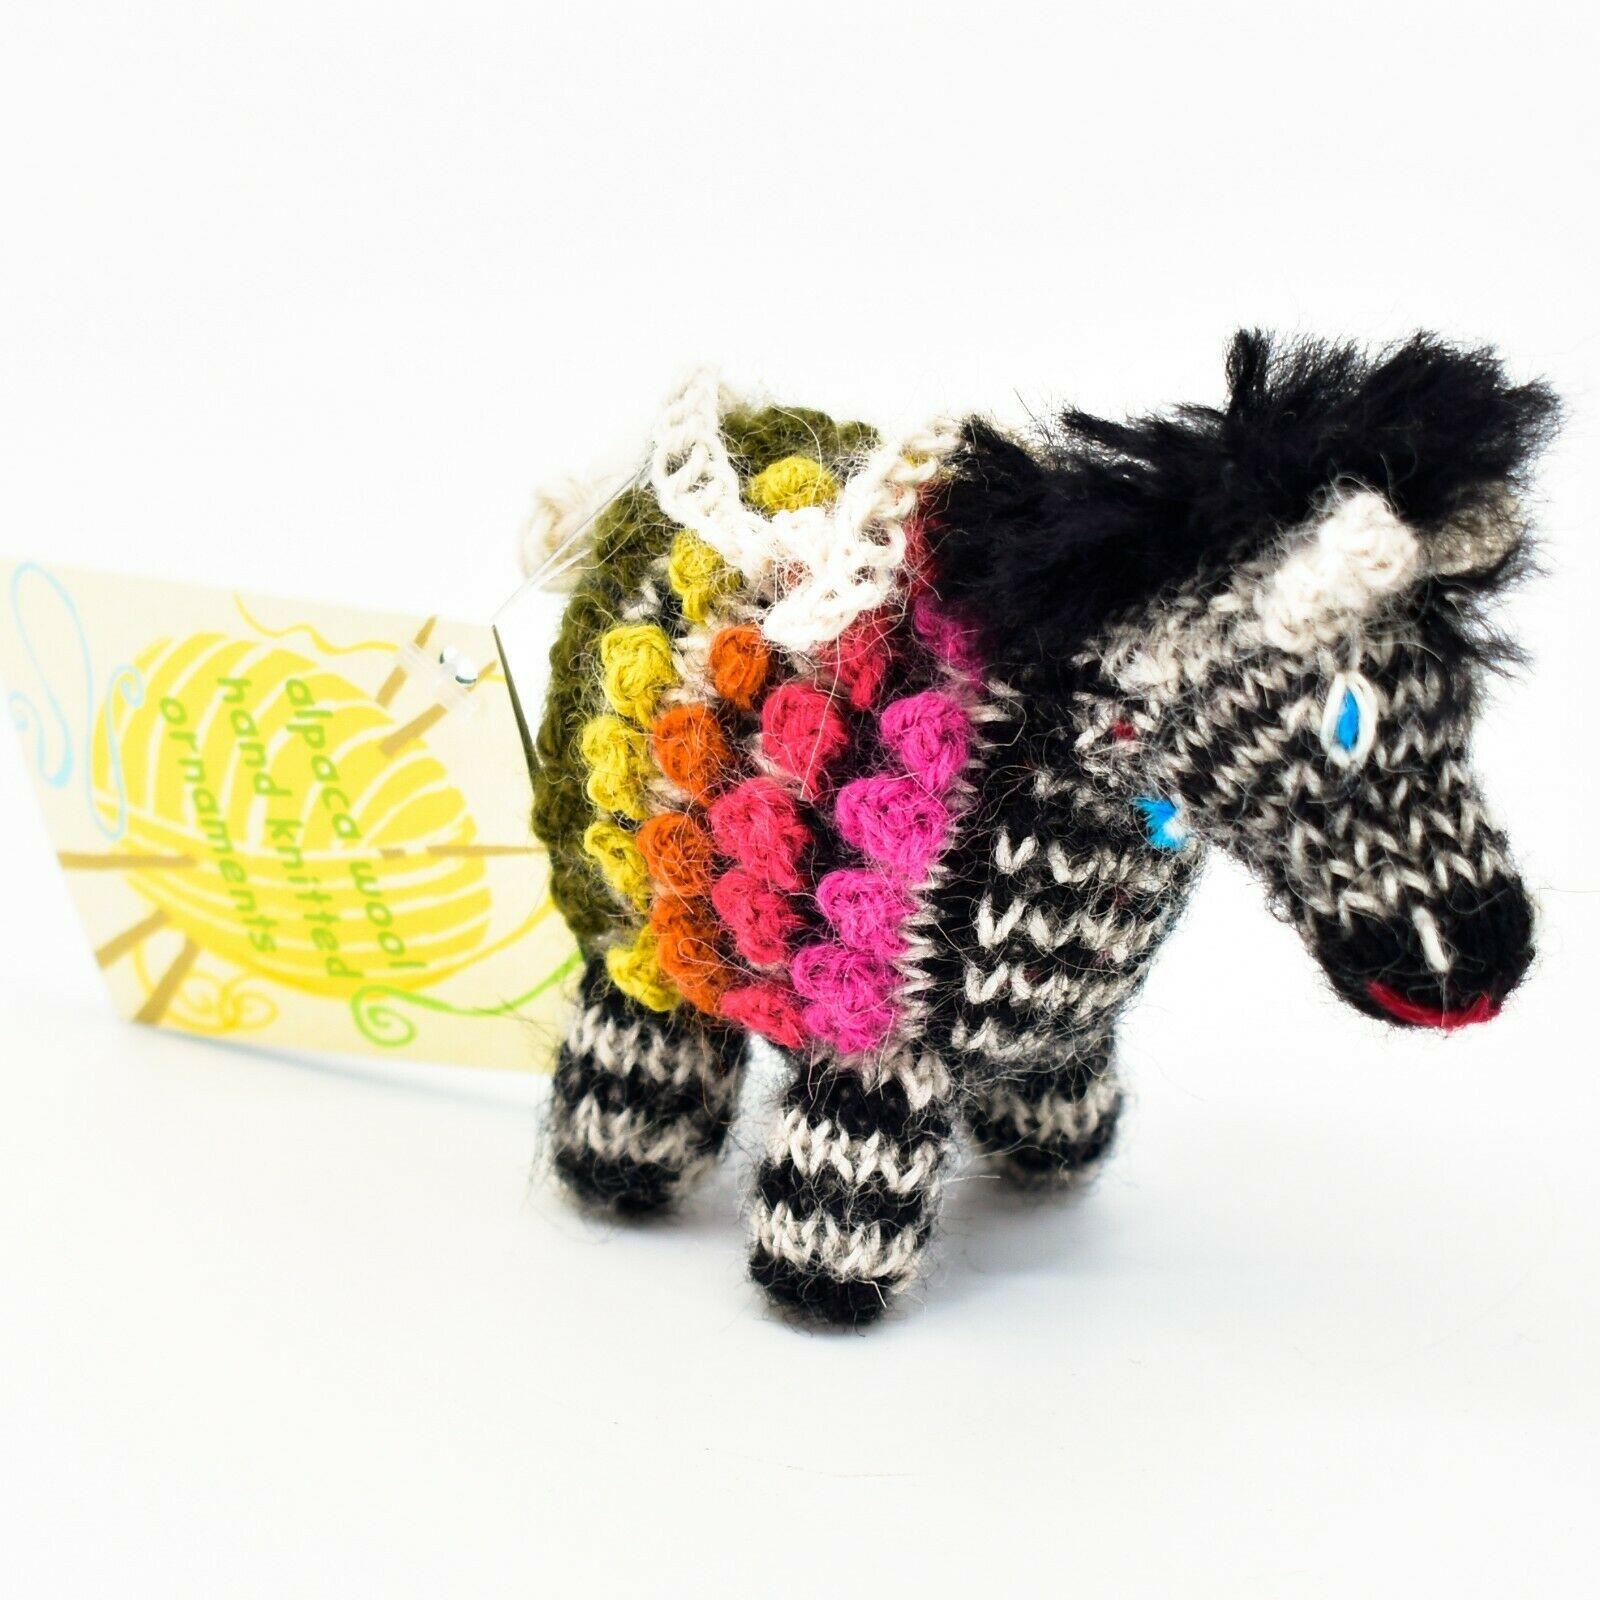 Handknit Alpaca Wool Whimsical Hanging Zebra Ornament Handmade in Peru